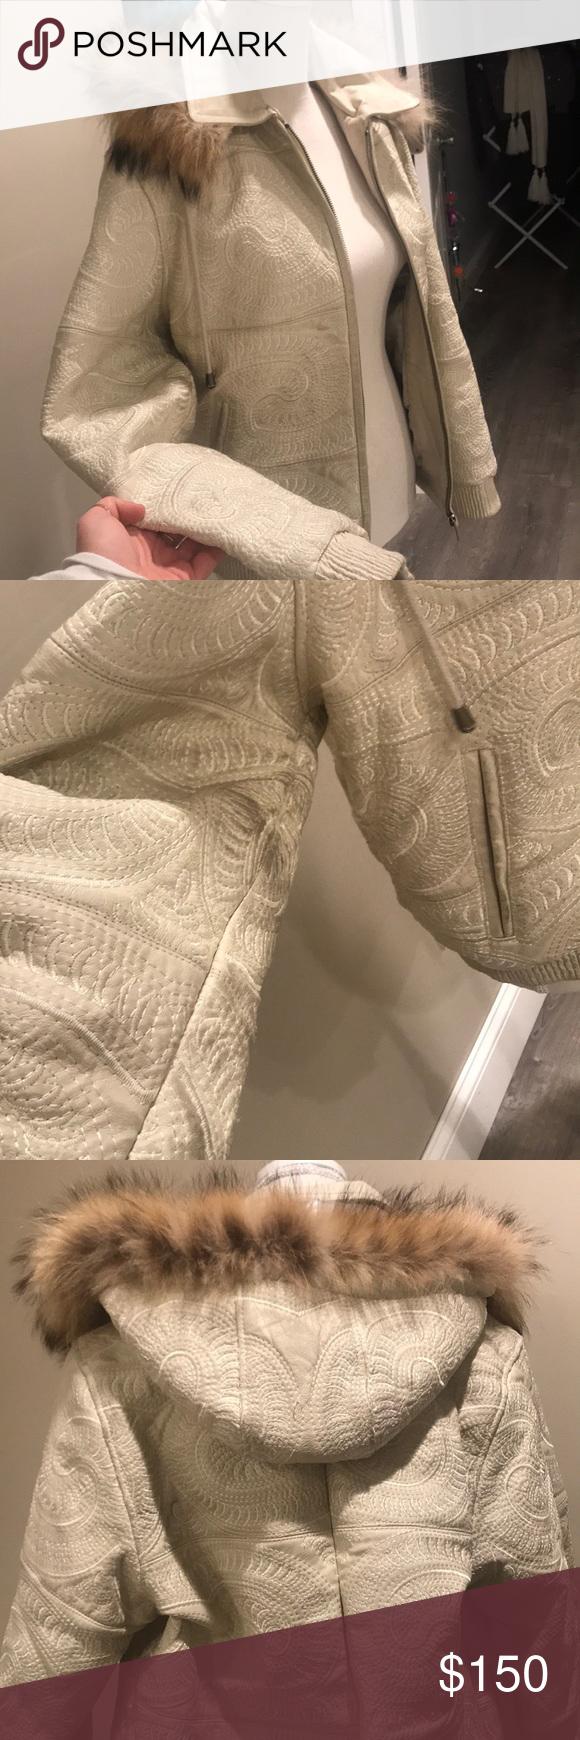 Vintage Vilanto Leather Jacket White Leather Jacket Leather Jacket Jackets [ 1740 x 580 Pixel ]